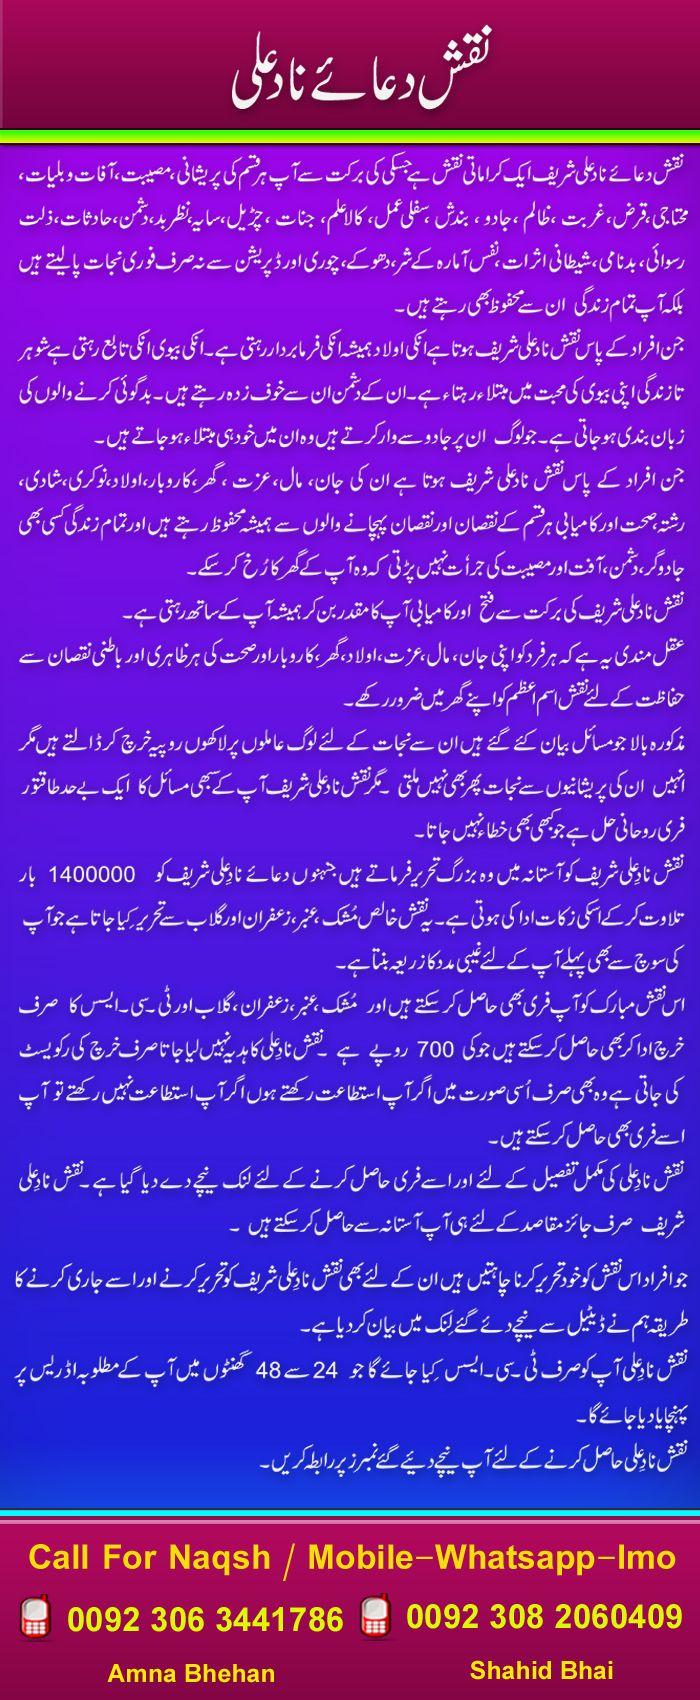 Dushman Ki Halakat Ki Dua Urdu Mein | Dushman Ki Halakat Ka